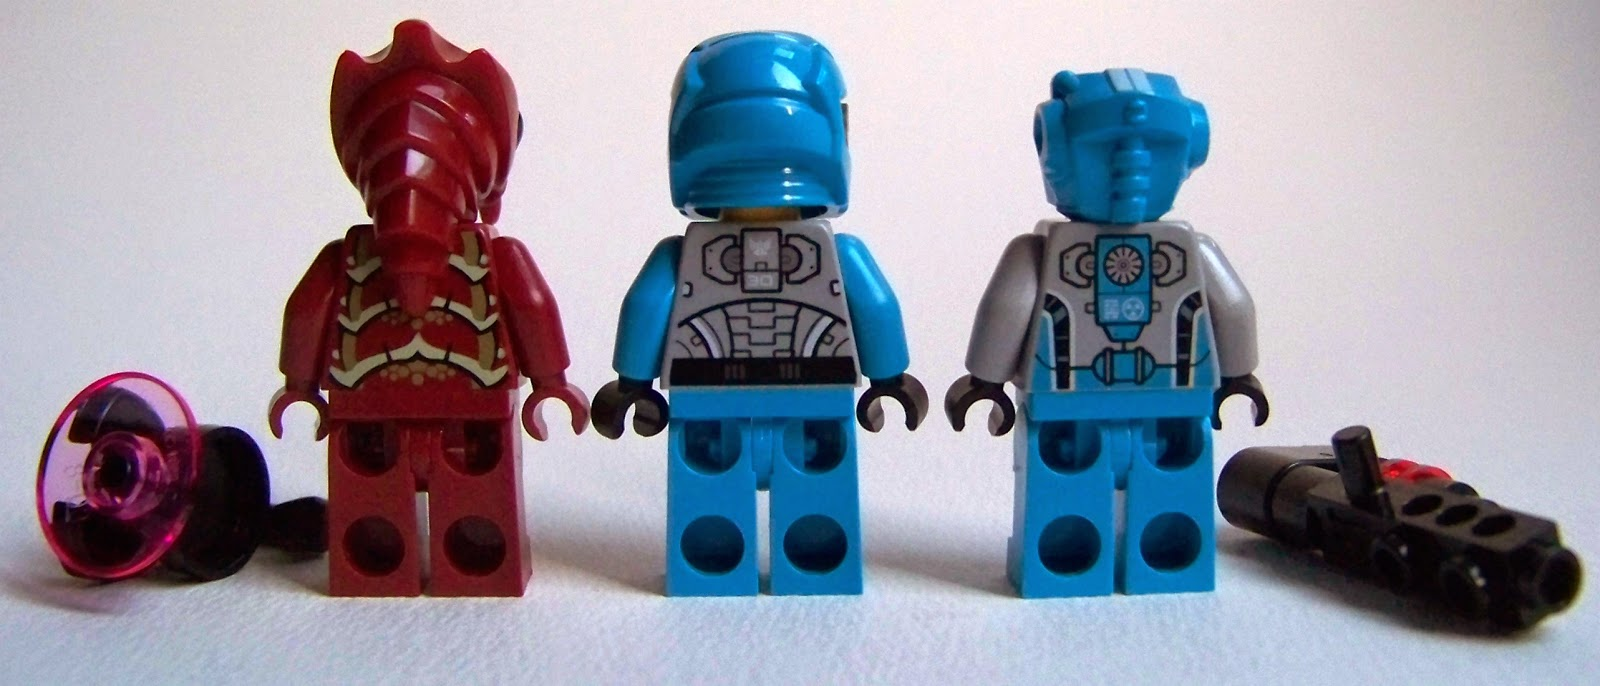 LEGO Galaxy Squad Minifigures